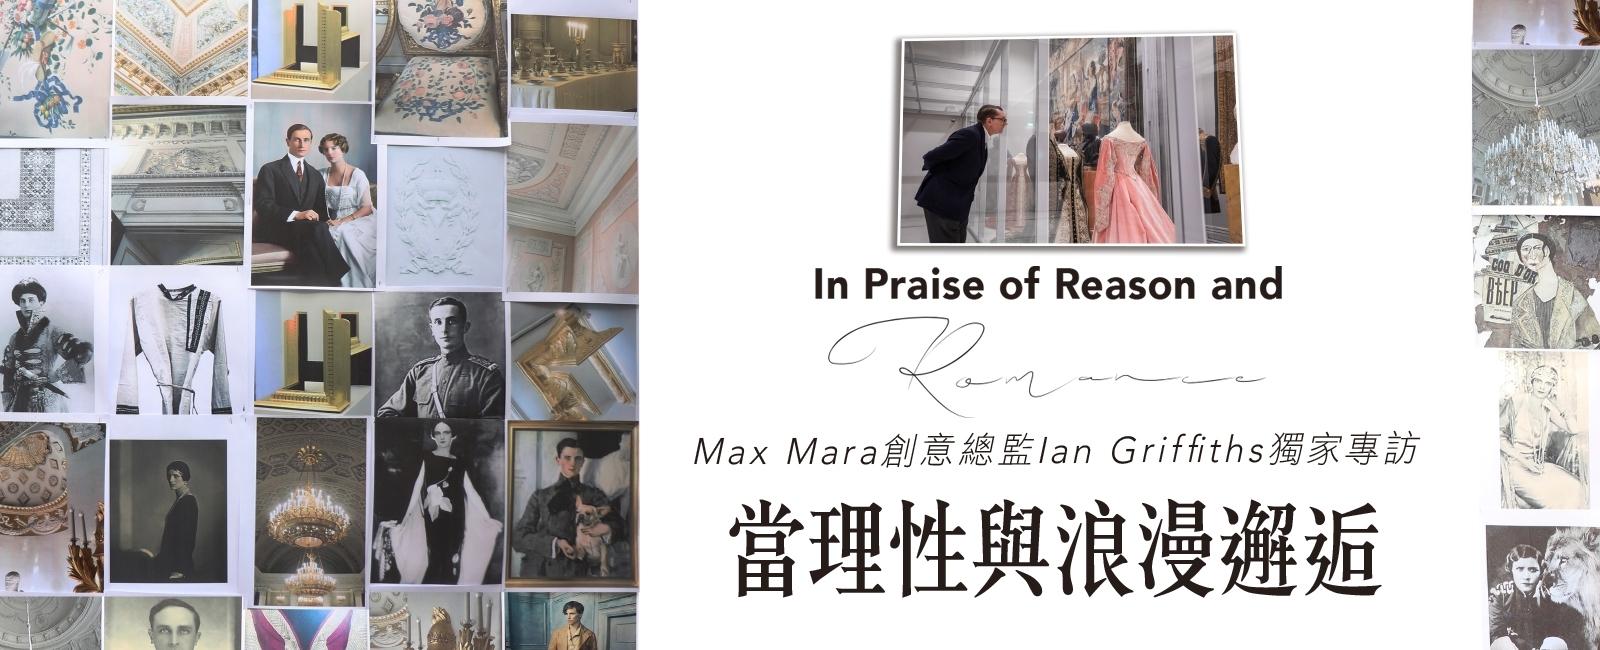 當理性與浪漫邂逅 Max Mara創意總監Ian Griffiths獨家專訪